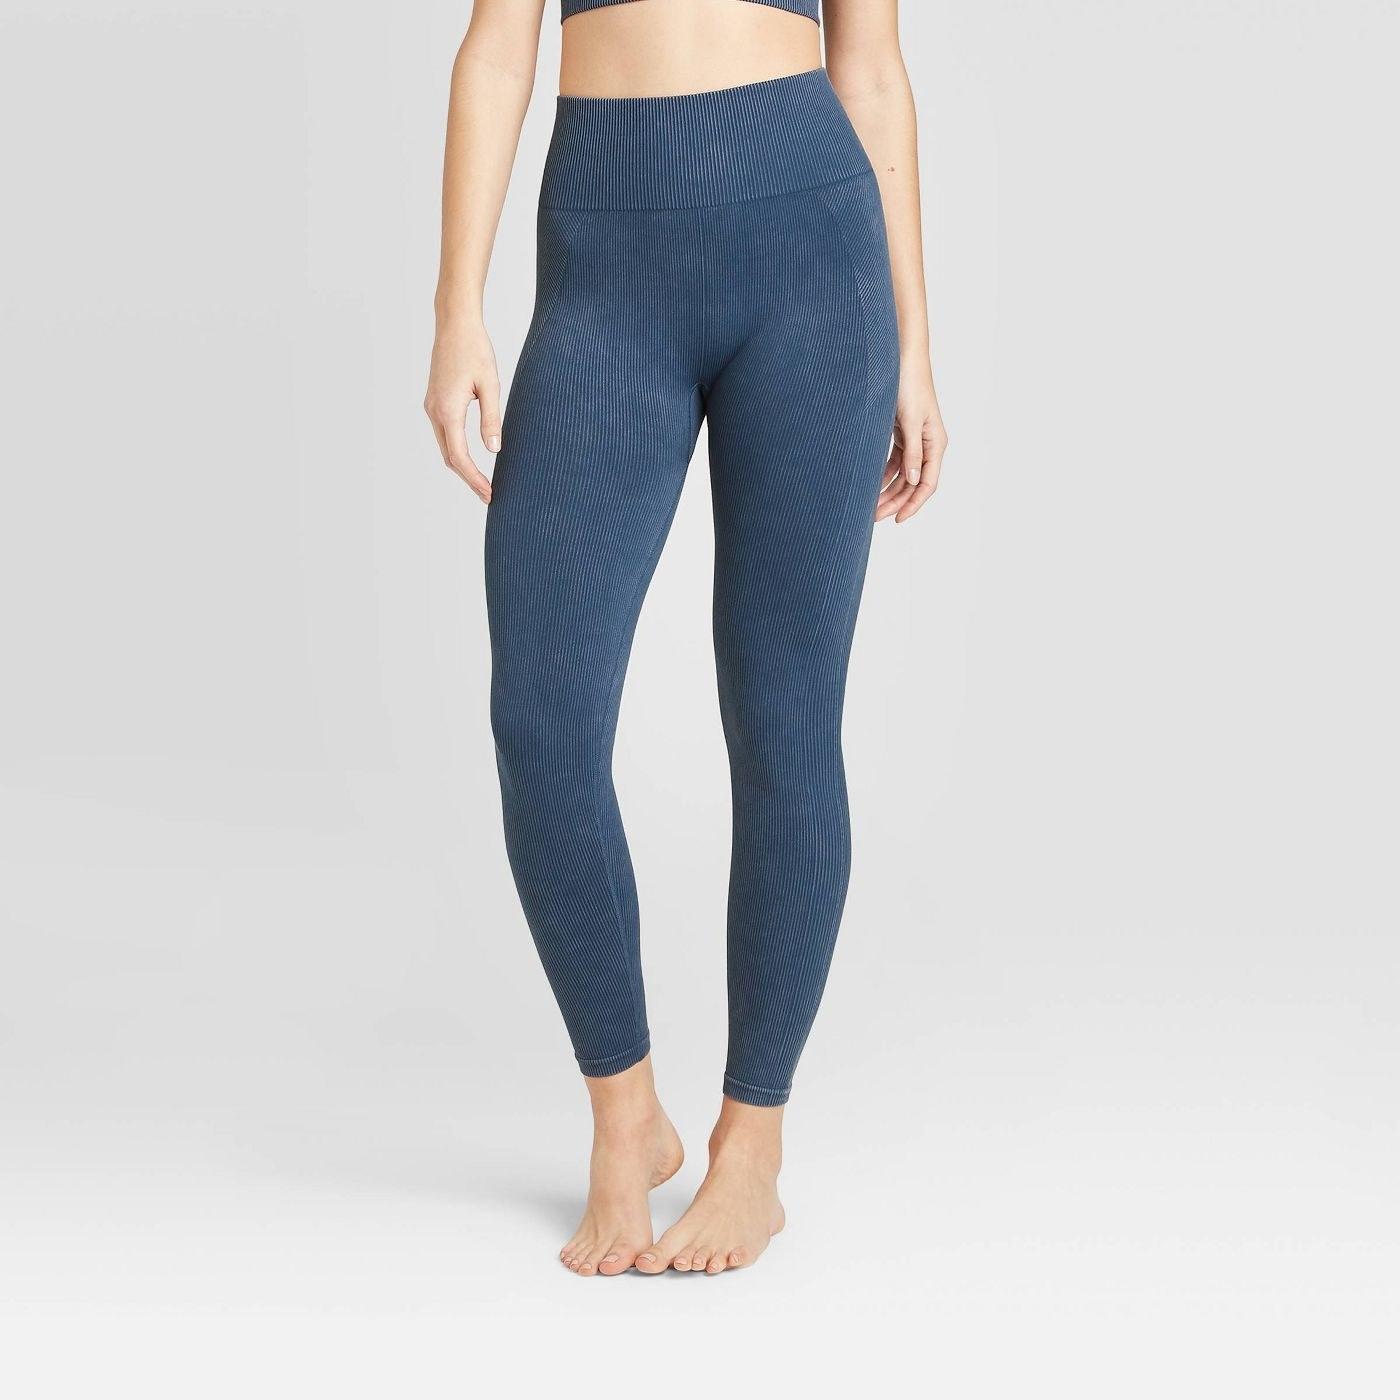 Model in blue seamless ribbed leggings